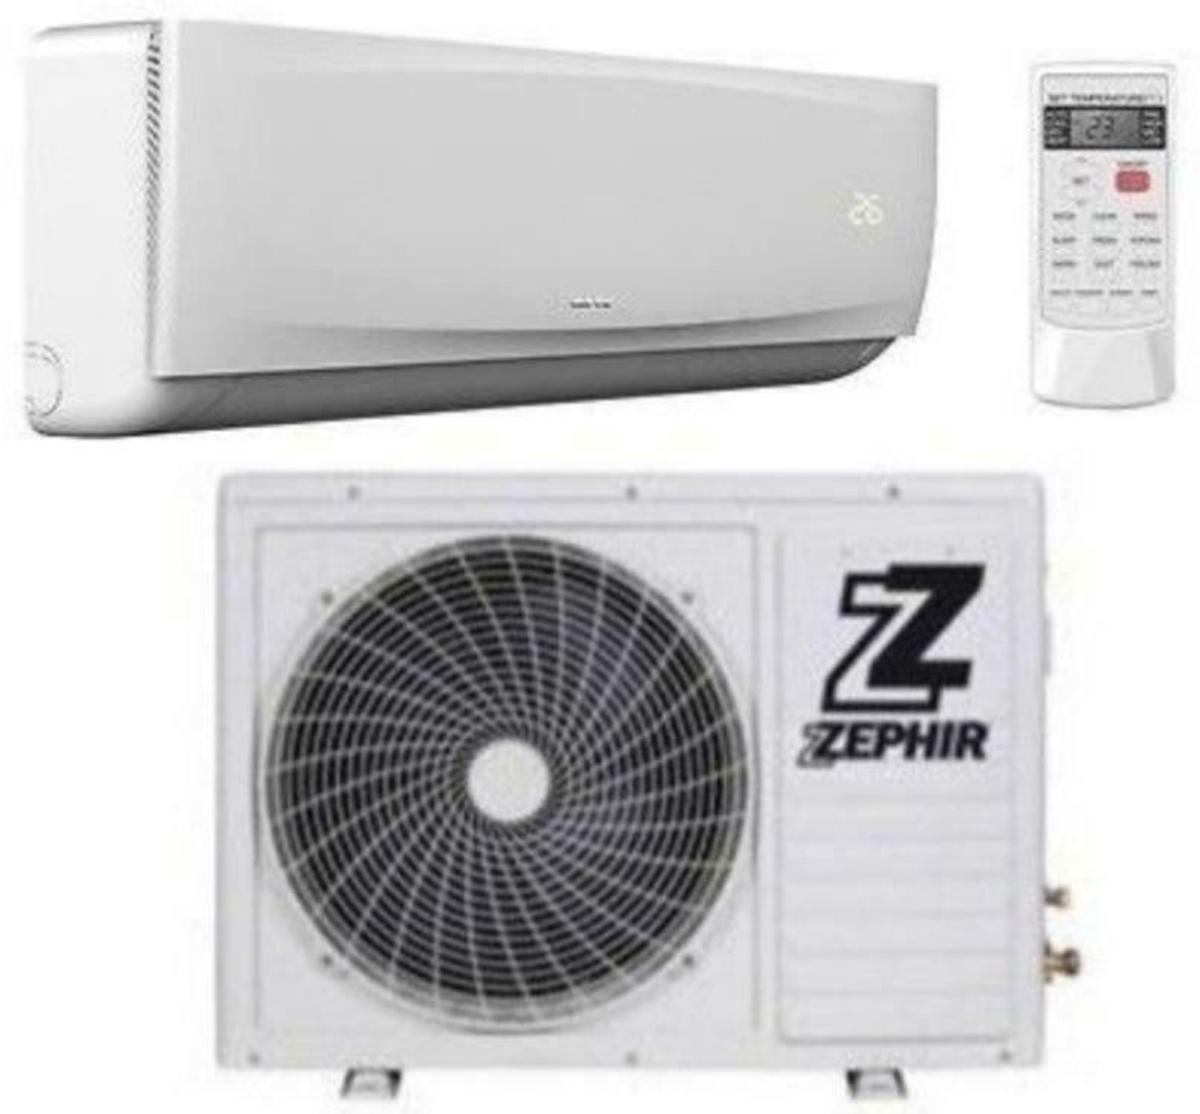 Split airco Zephir 12000 Btu kopen